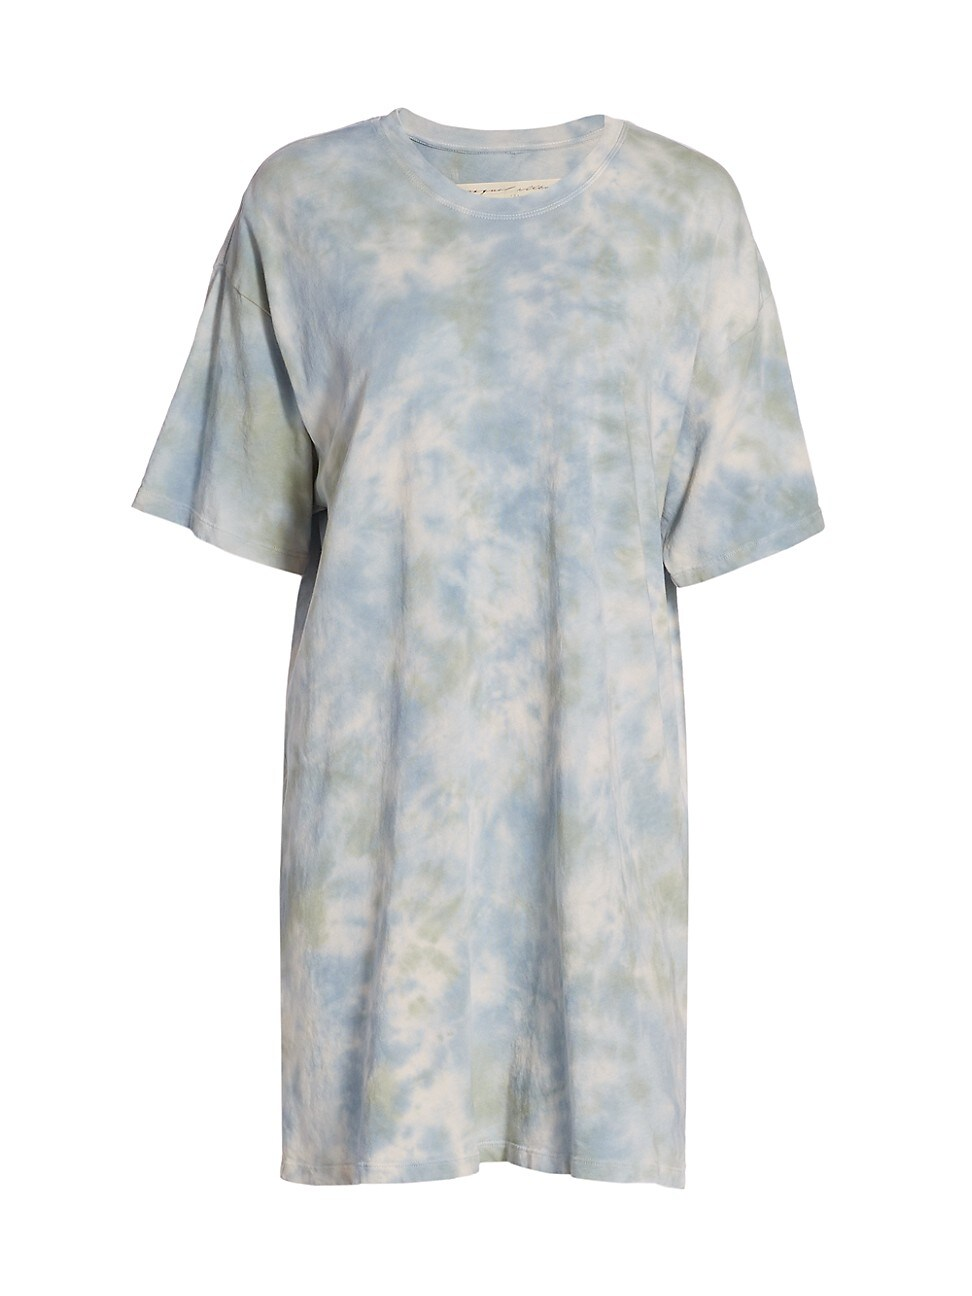 Raquel Allegra WOMEN'S TIE-DYE T-SHIRT DRESS